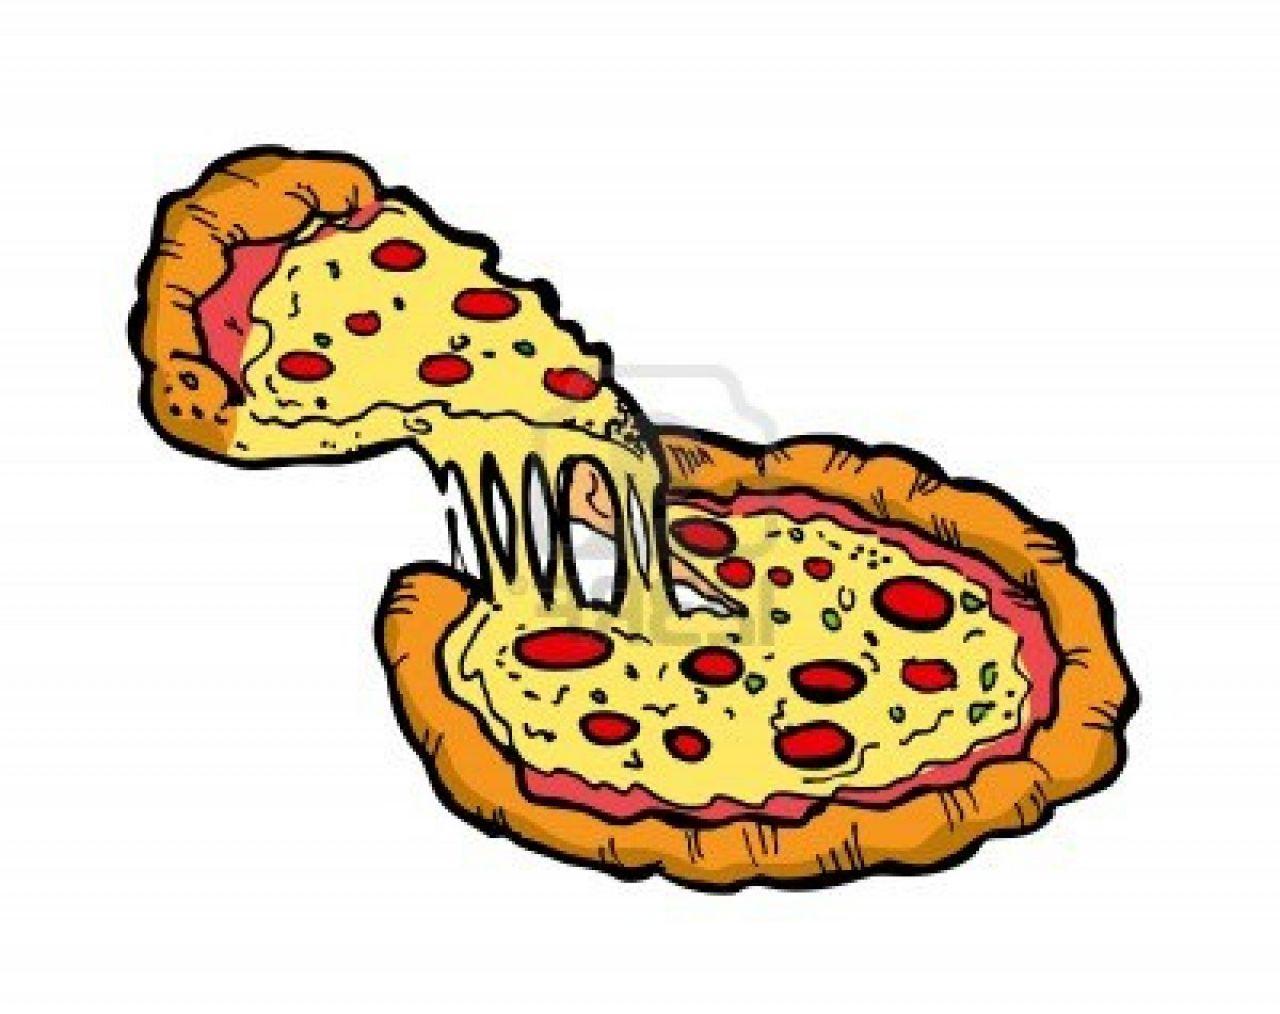 1280x1014 Pie Clipart Pizza Pie